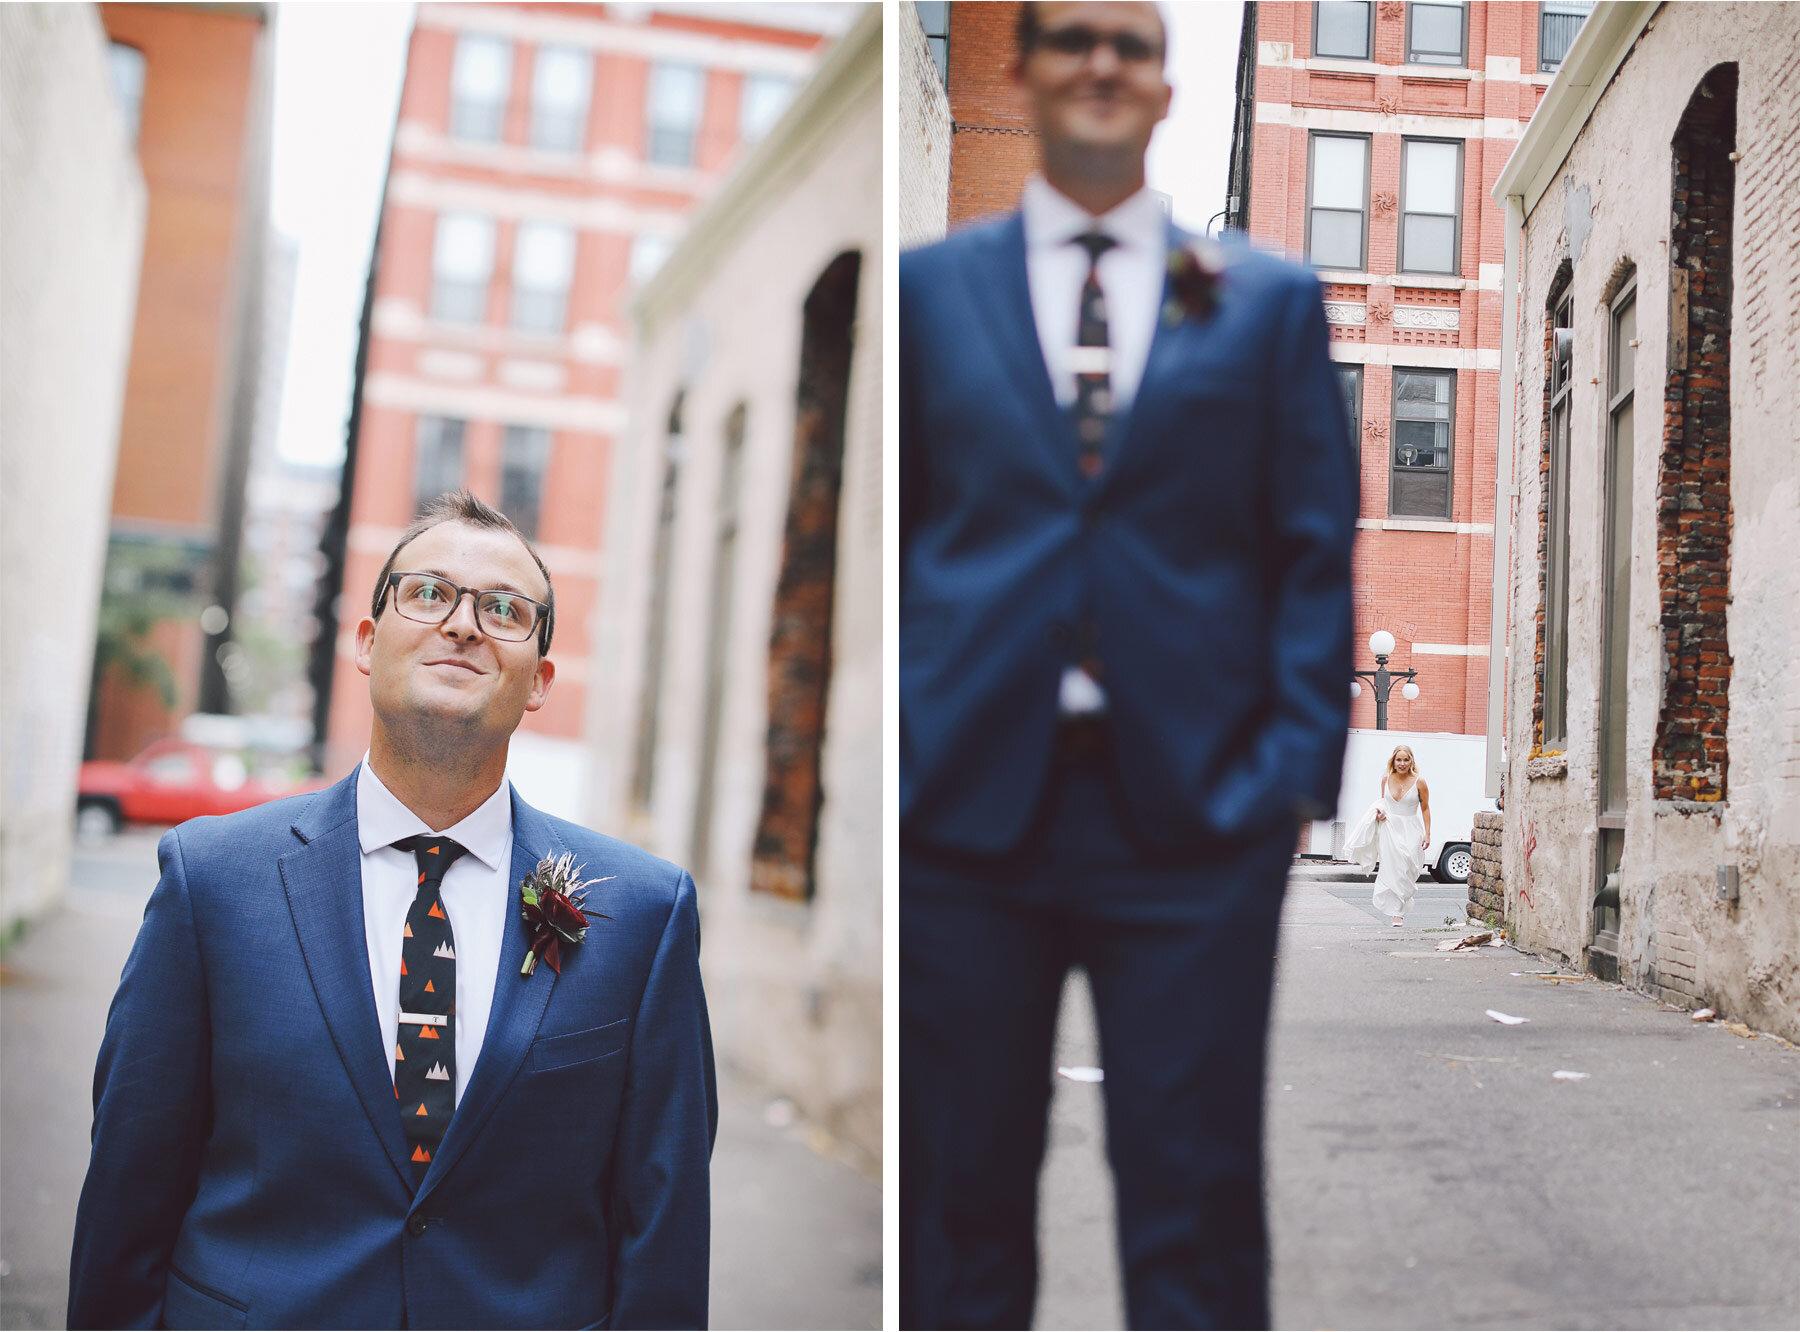 02-Vick-Photography-Wedding-Minneapolis-Minnesota-Downtown-Alley-Groom-Danielle-and-Tom.jpg